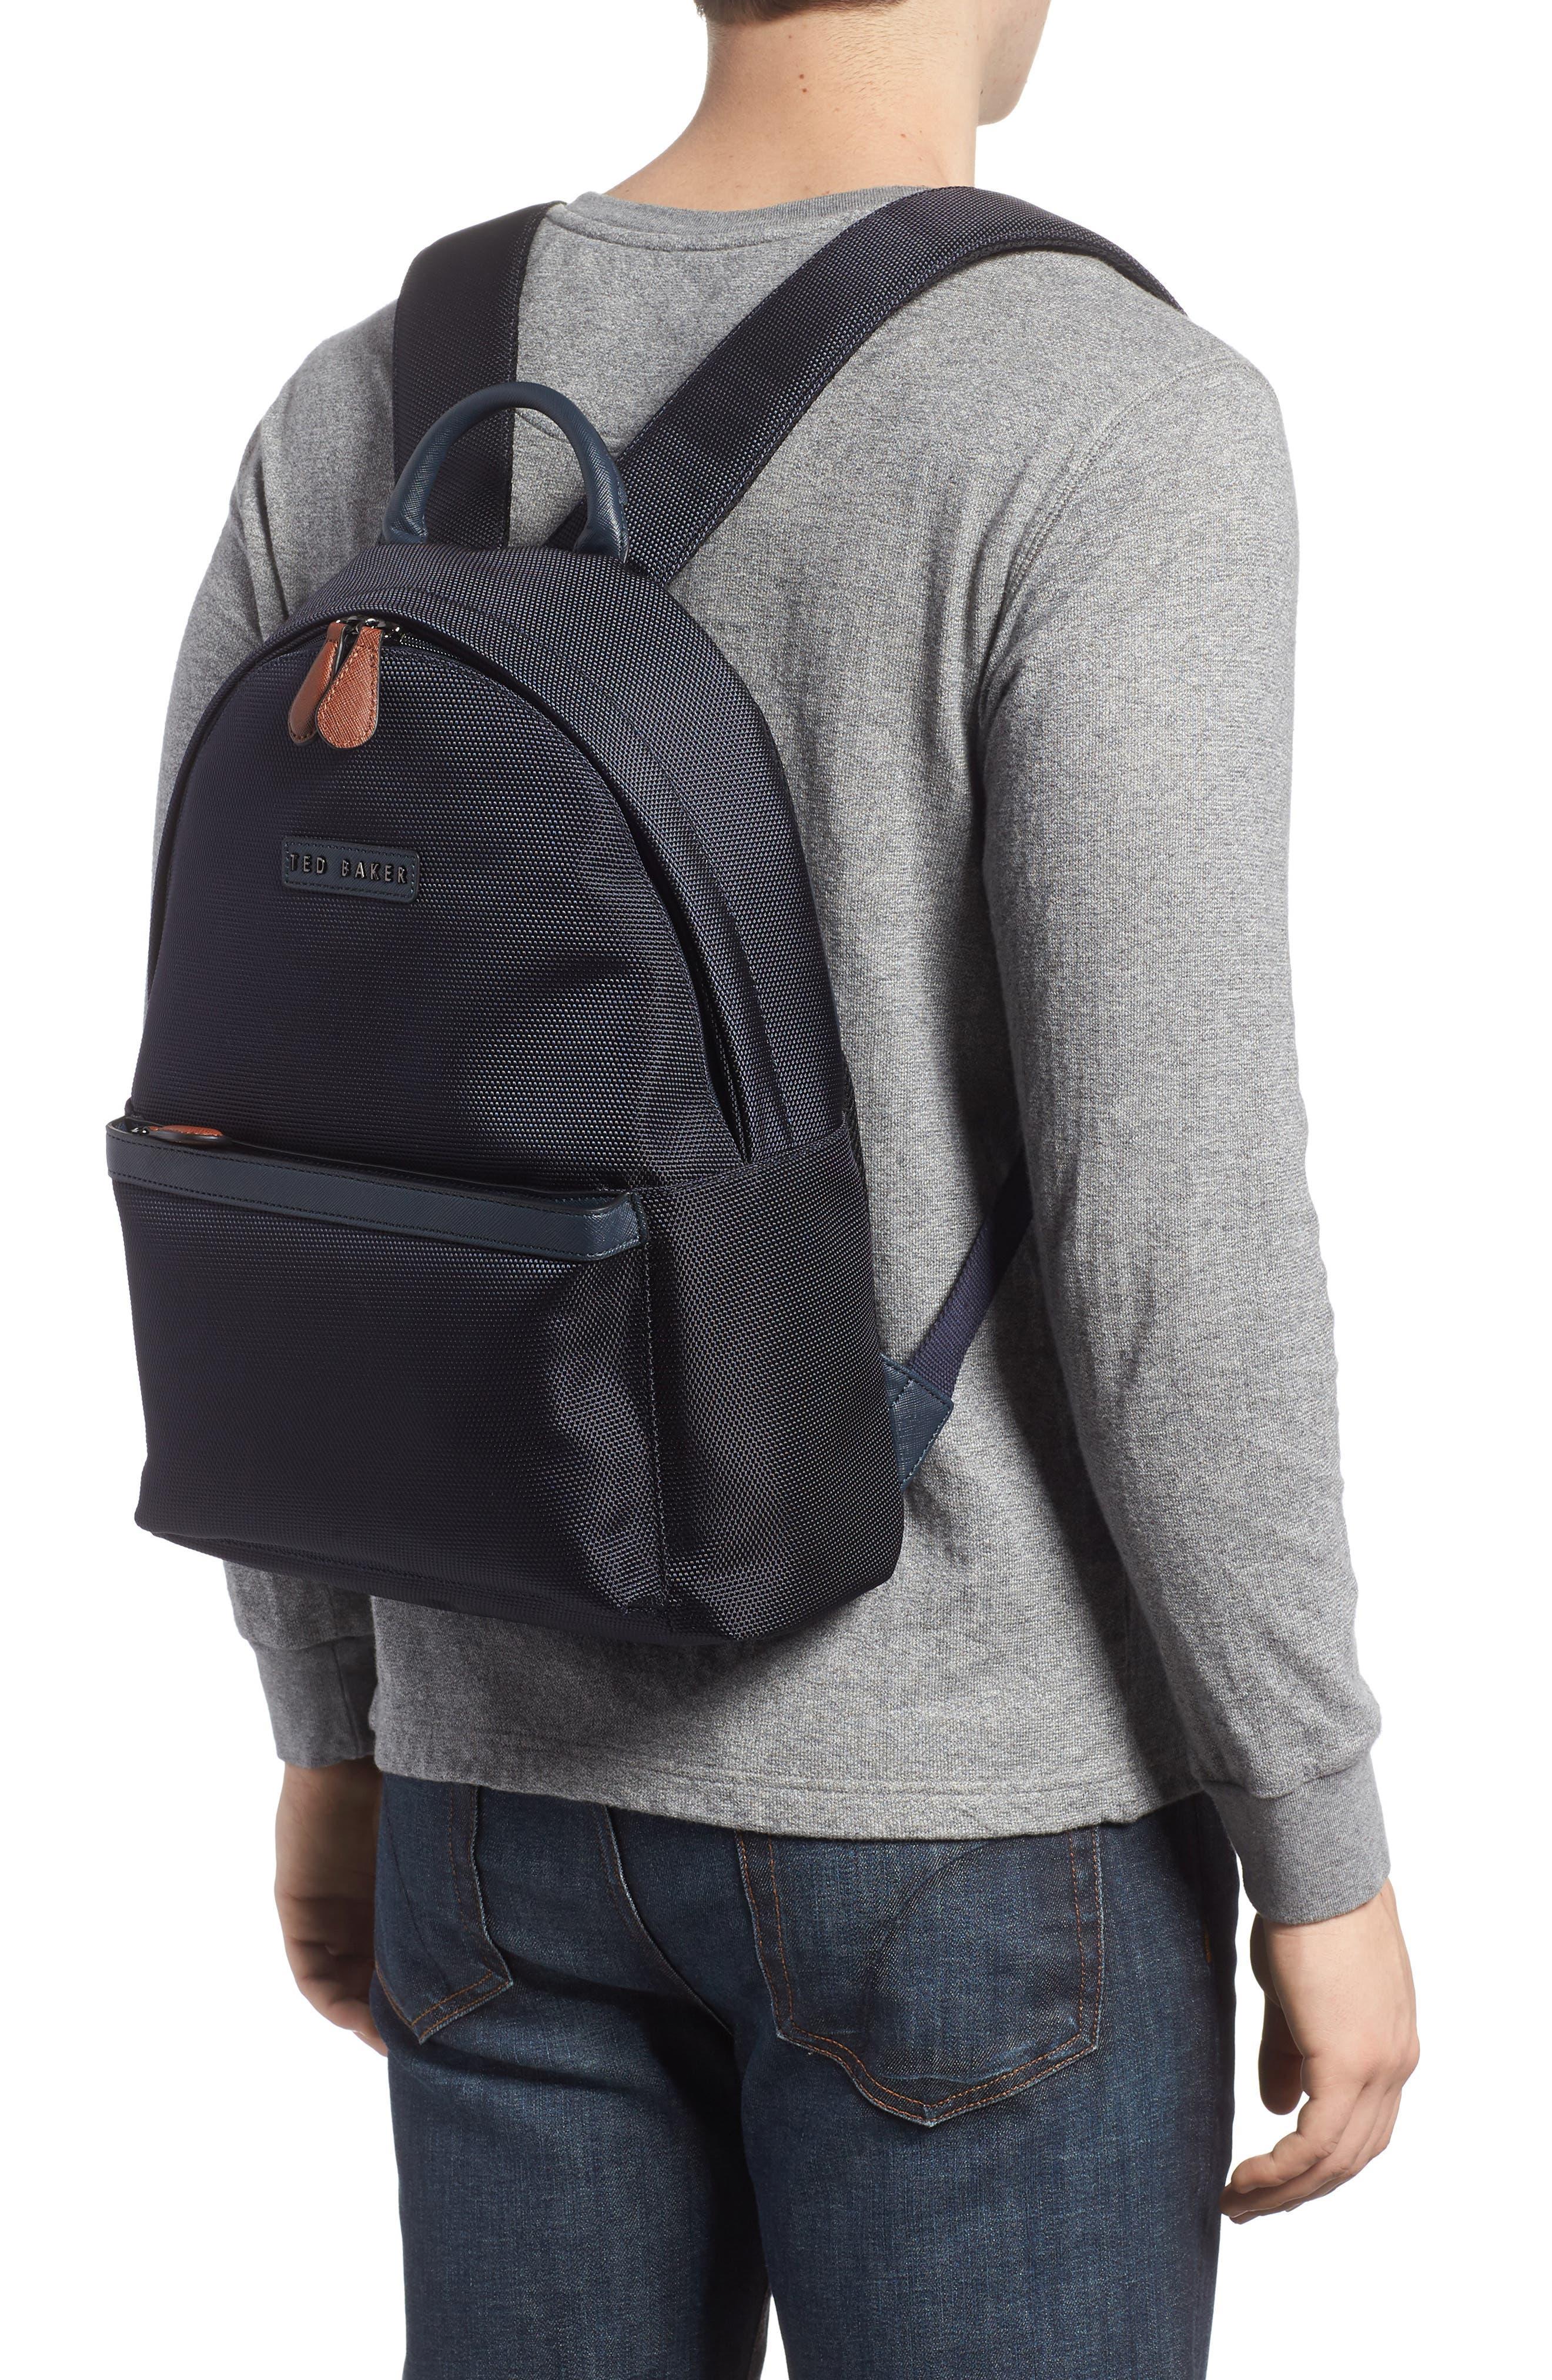 Brakes Backpack,                             Alternate thumbnail 2, color,                             410